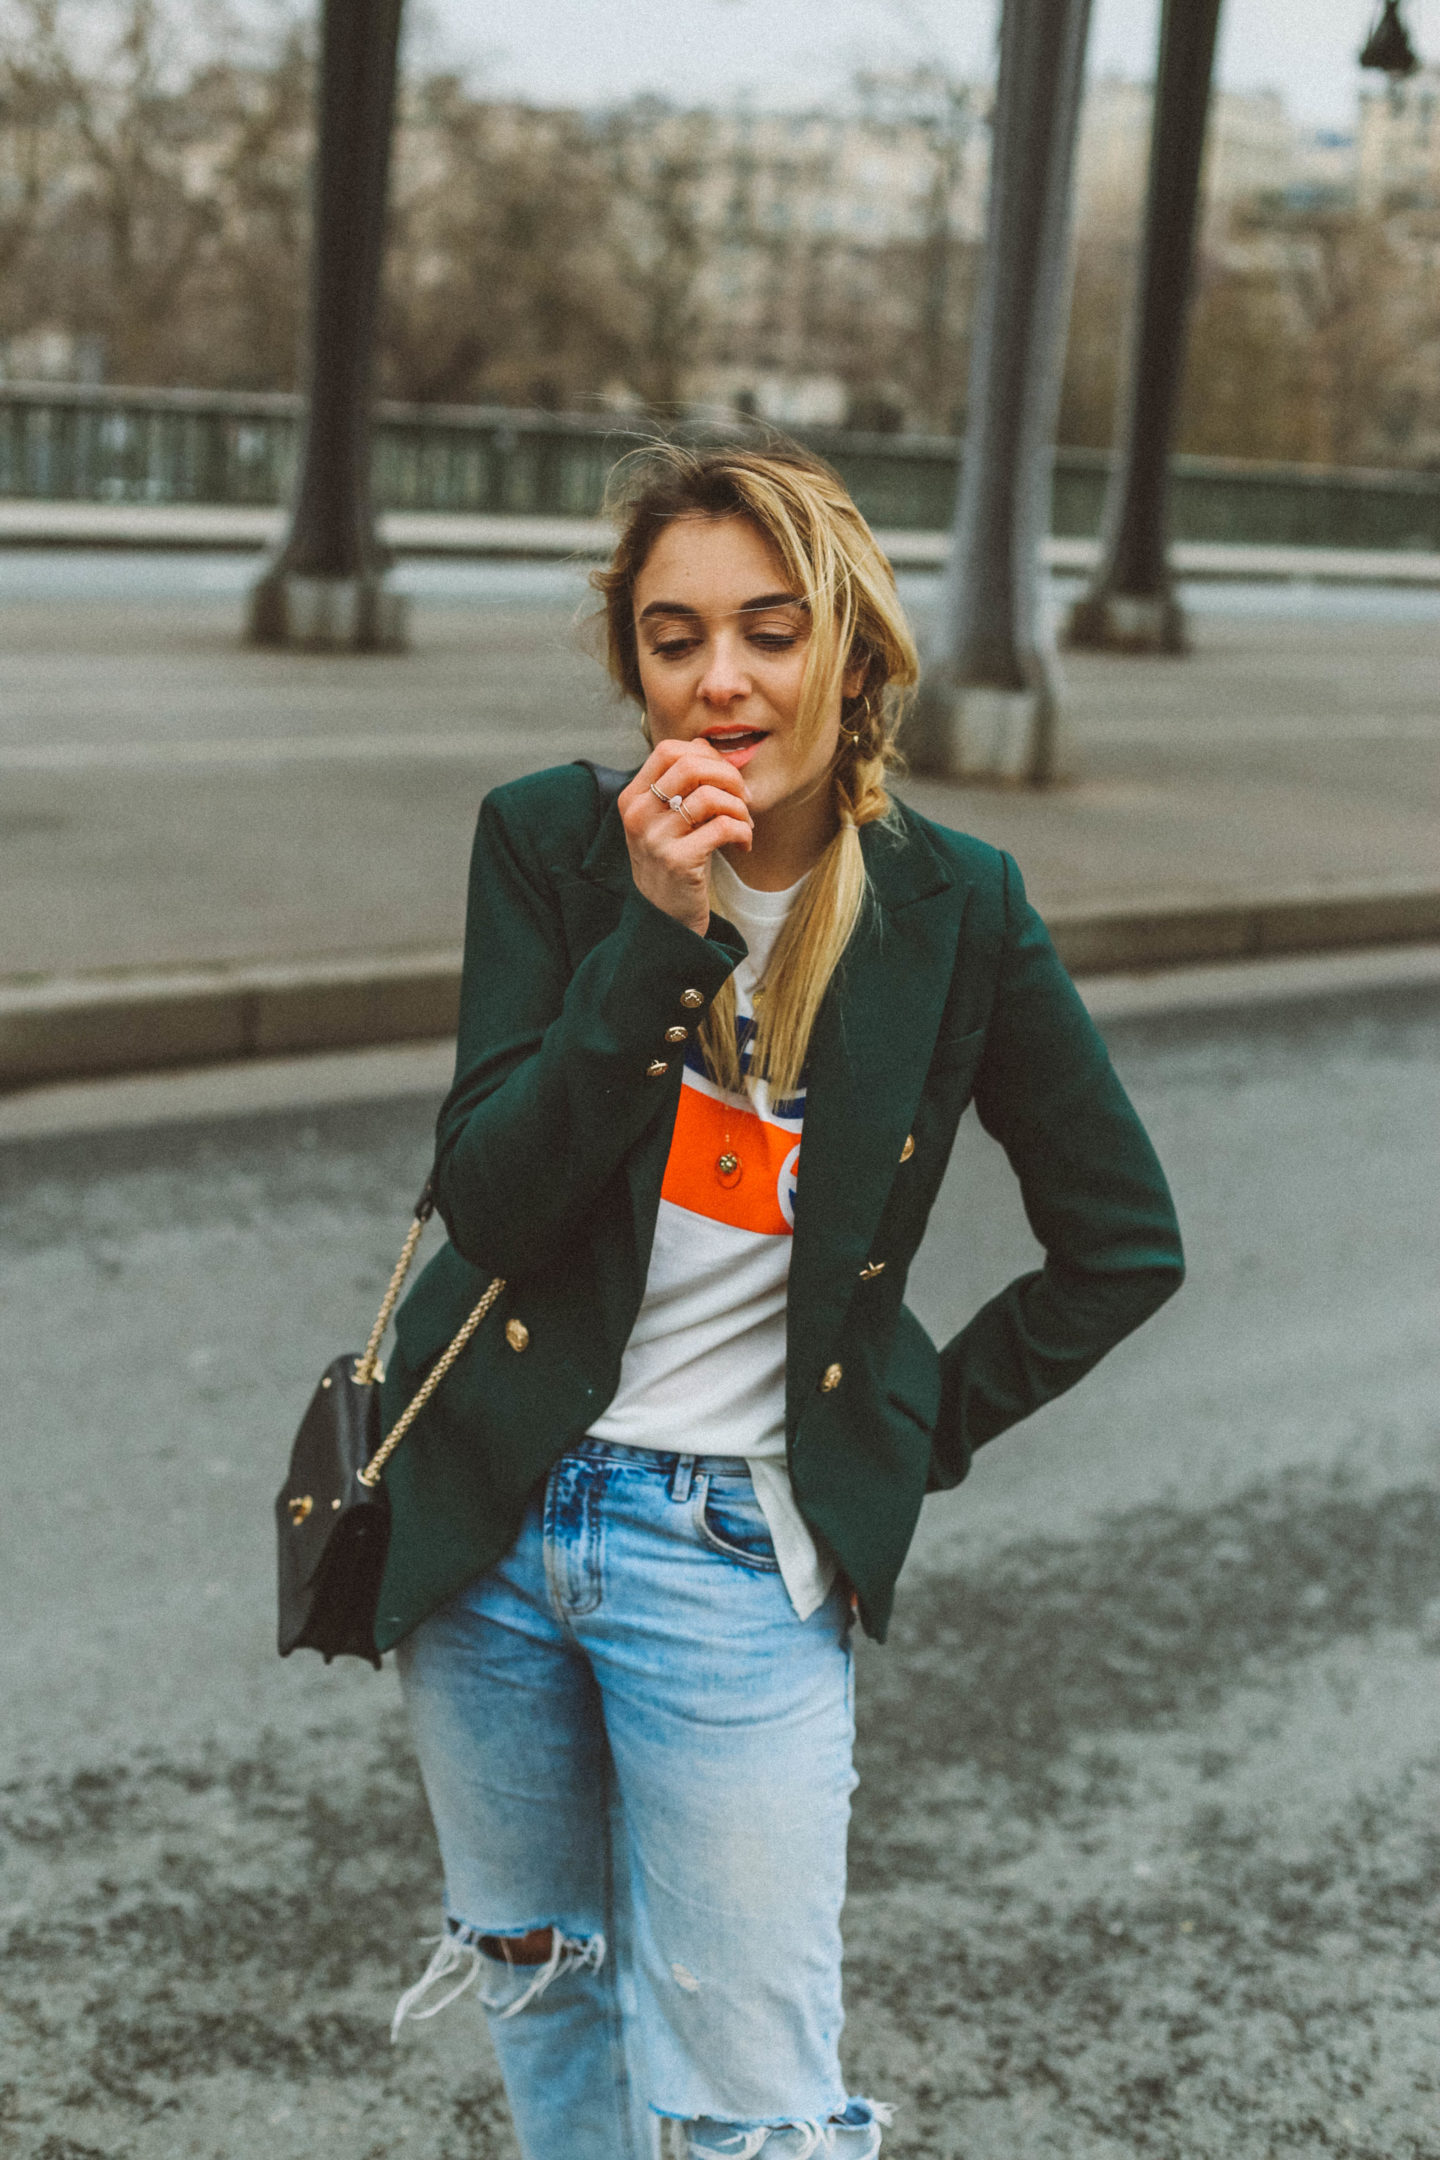 Bijoux Emile et Yvonne - Blondie Baby blog mode et voyages